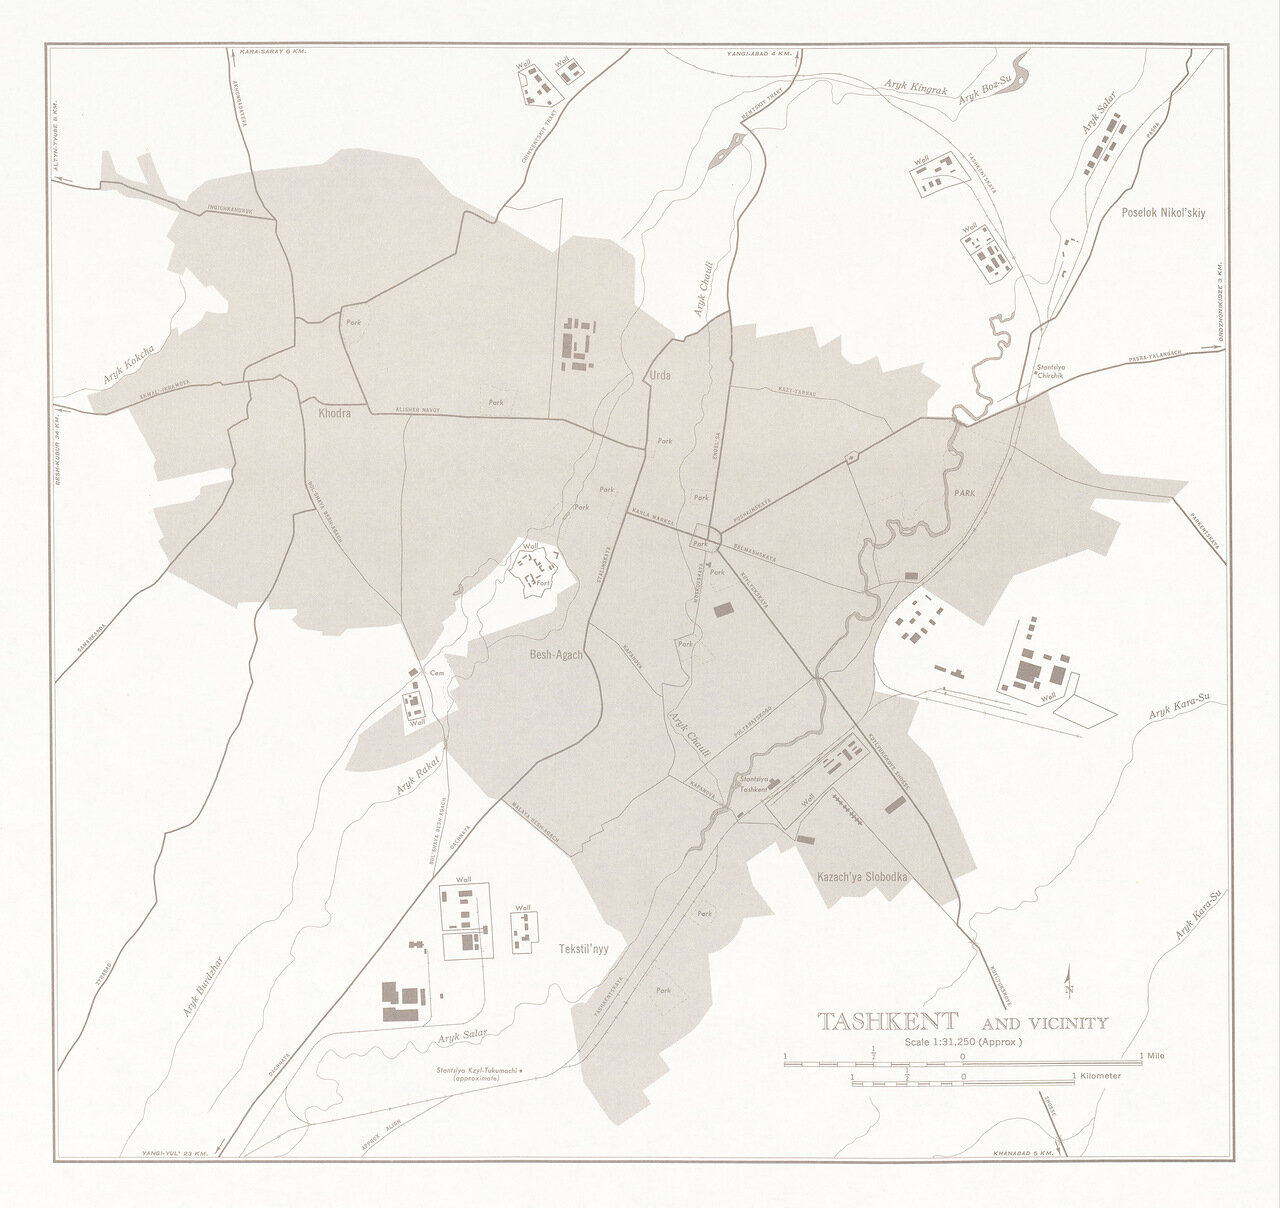 Ташкент и окрестности